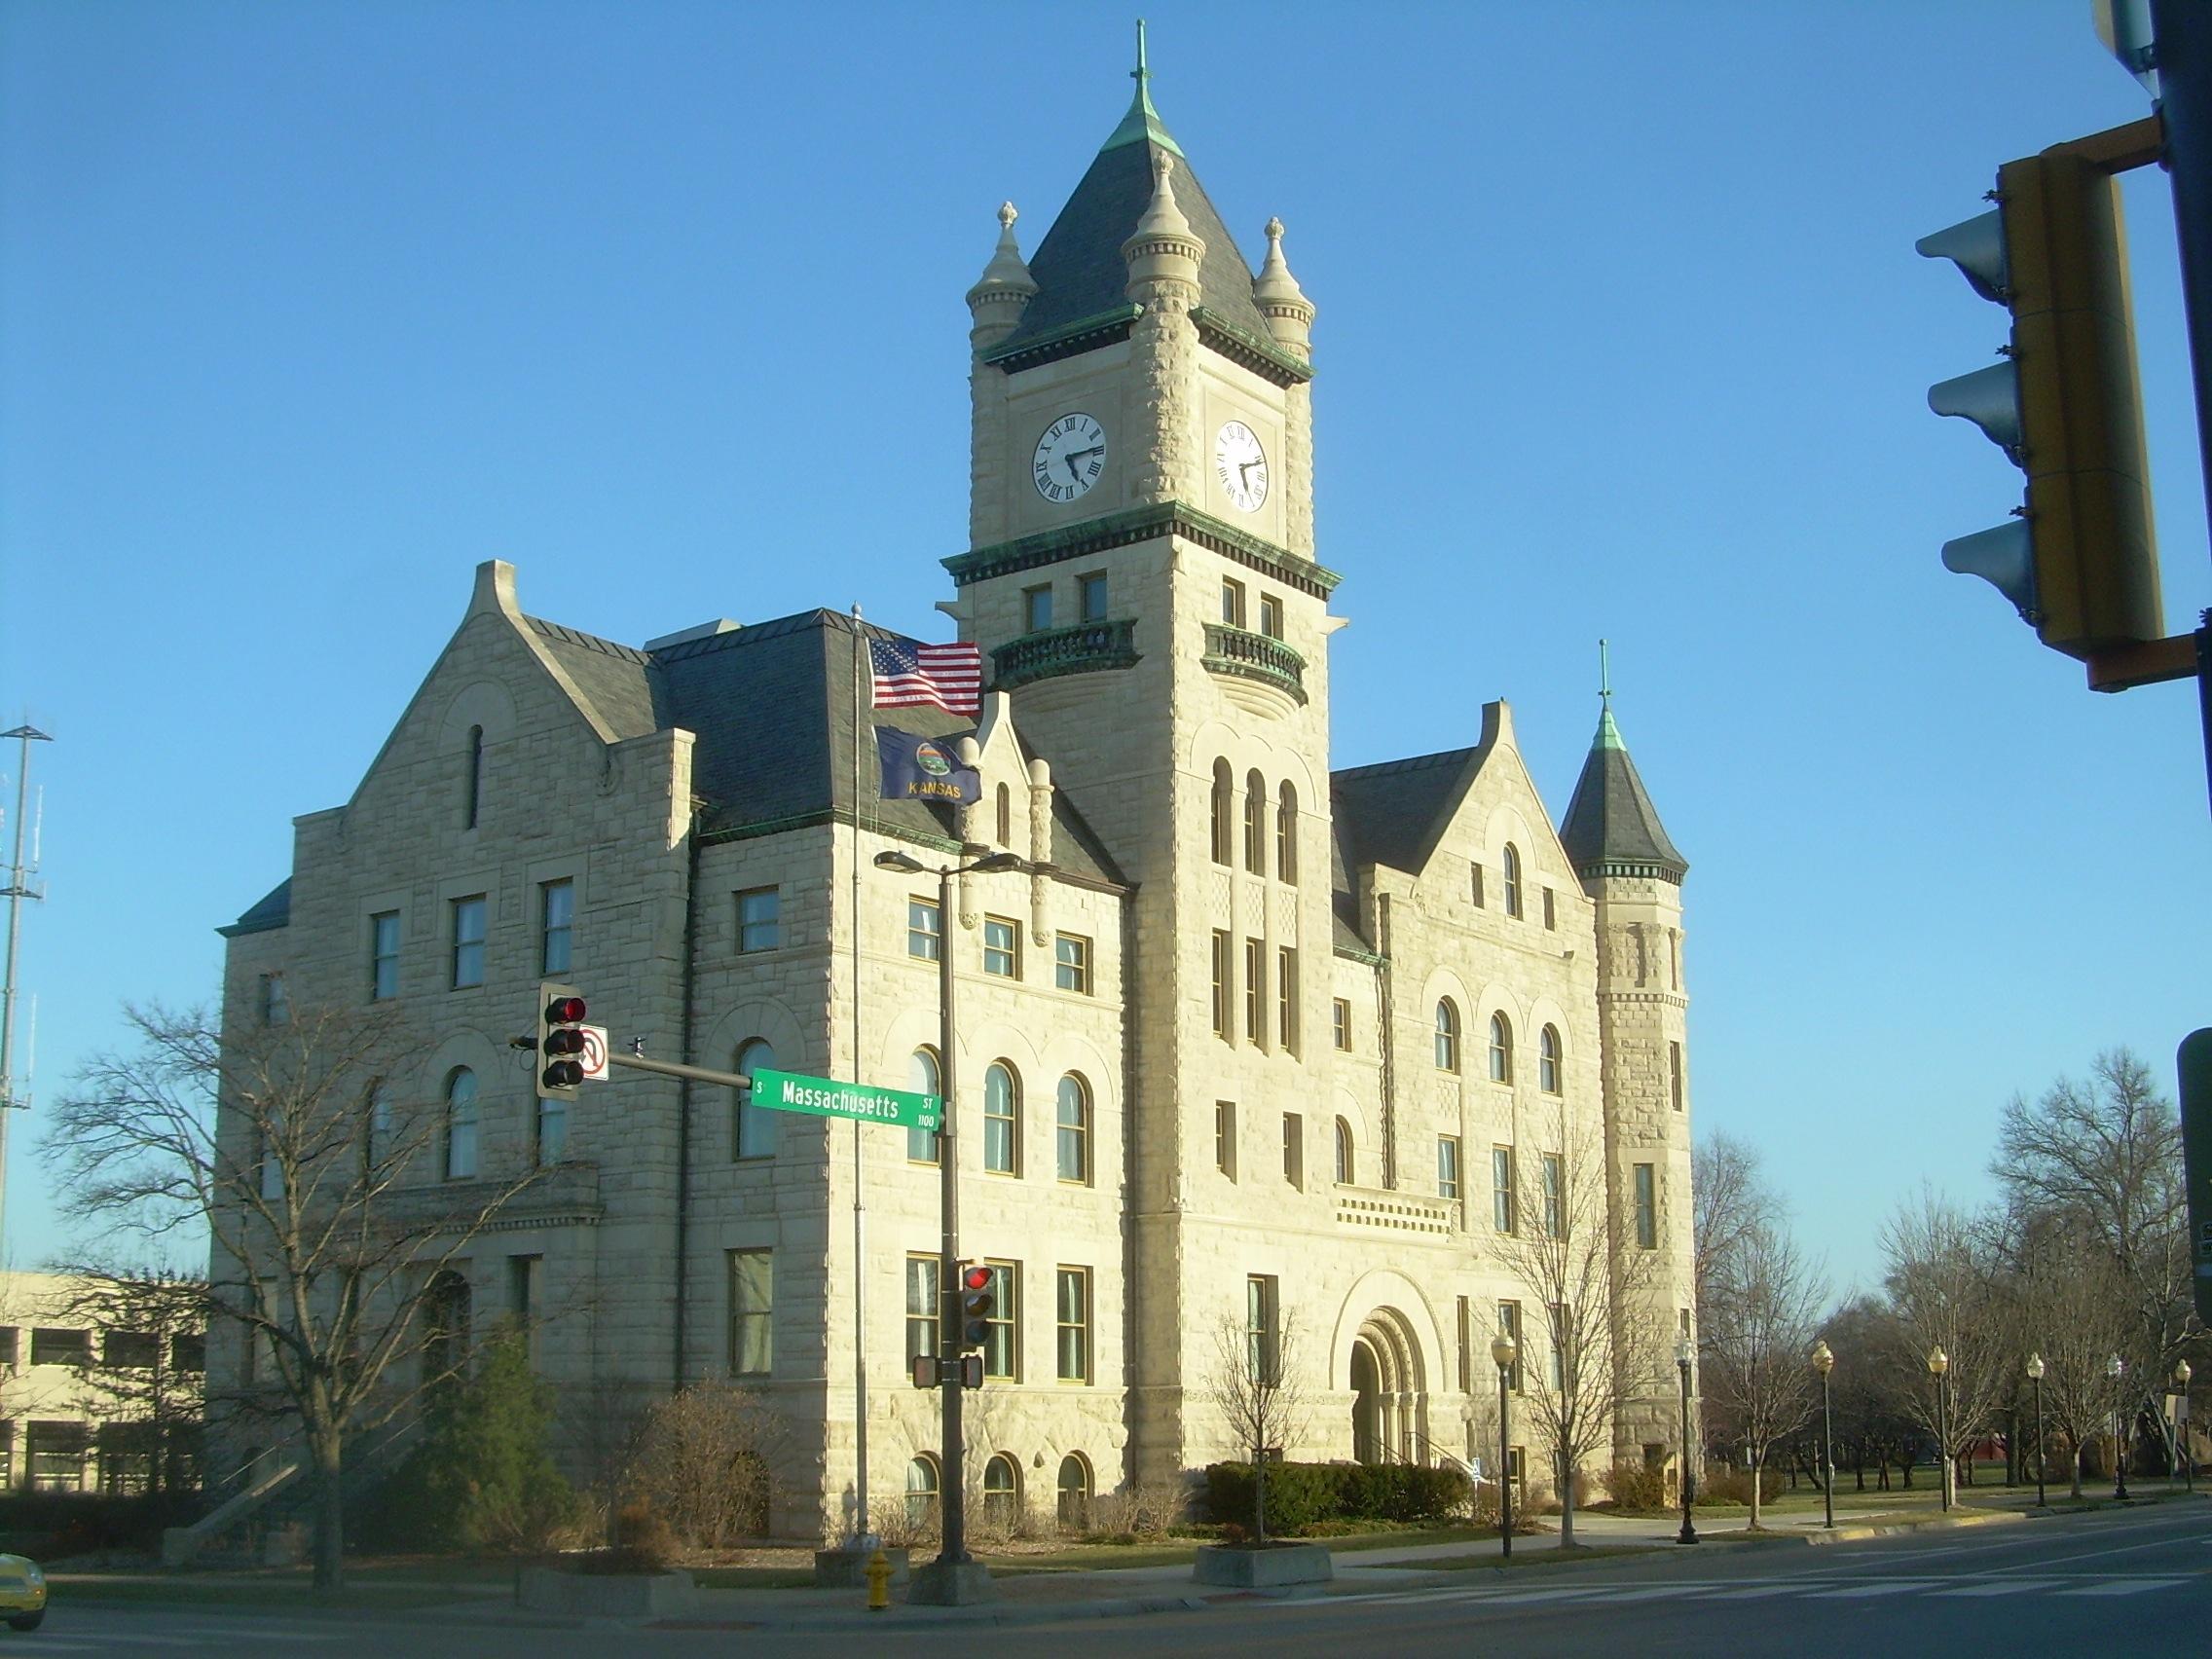 File:Douglass County courthouse, Lawrence, Kansas jpg